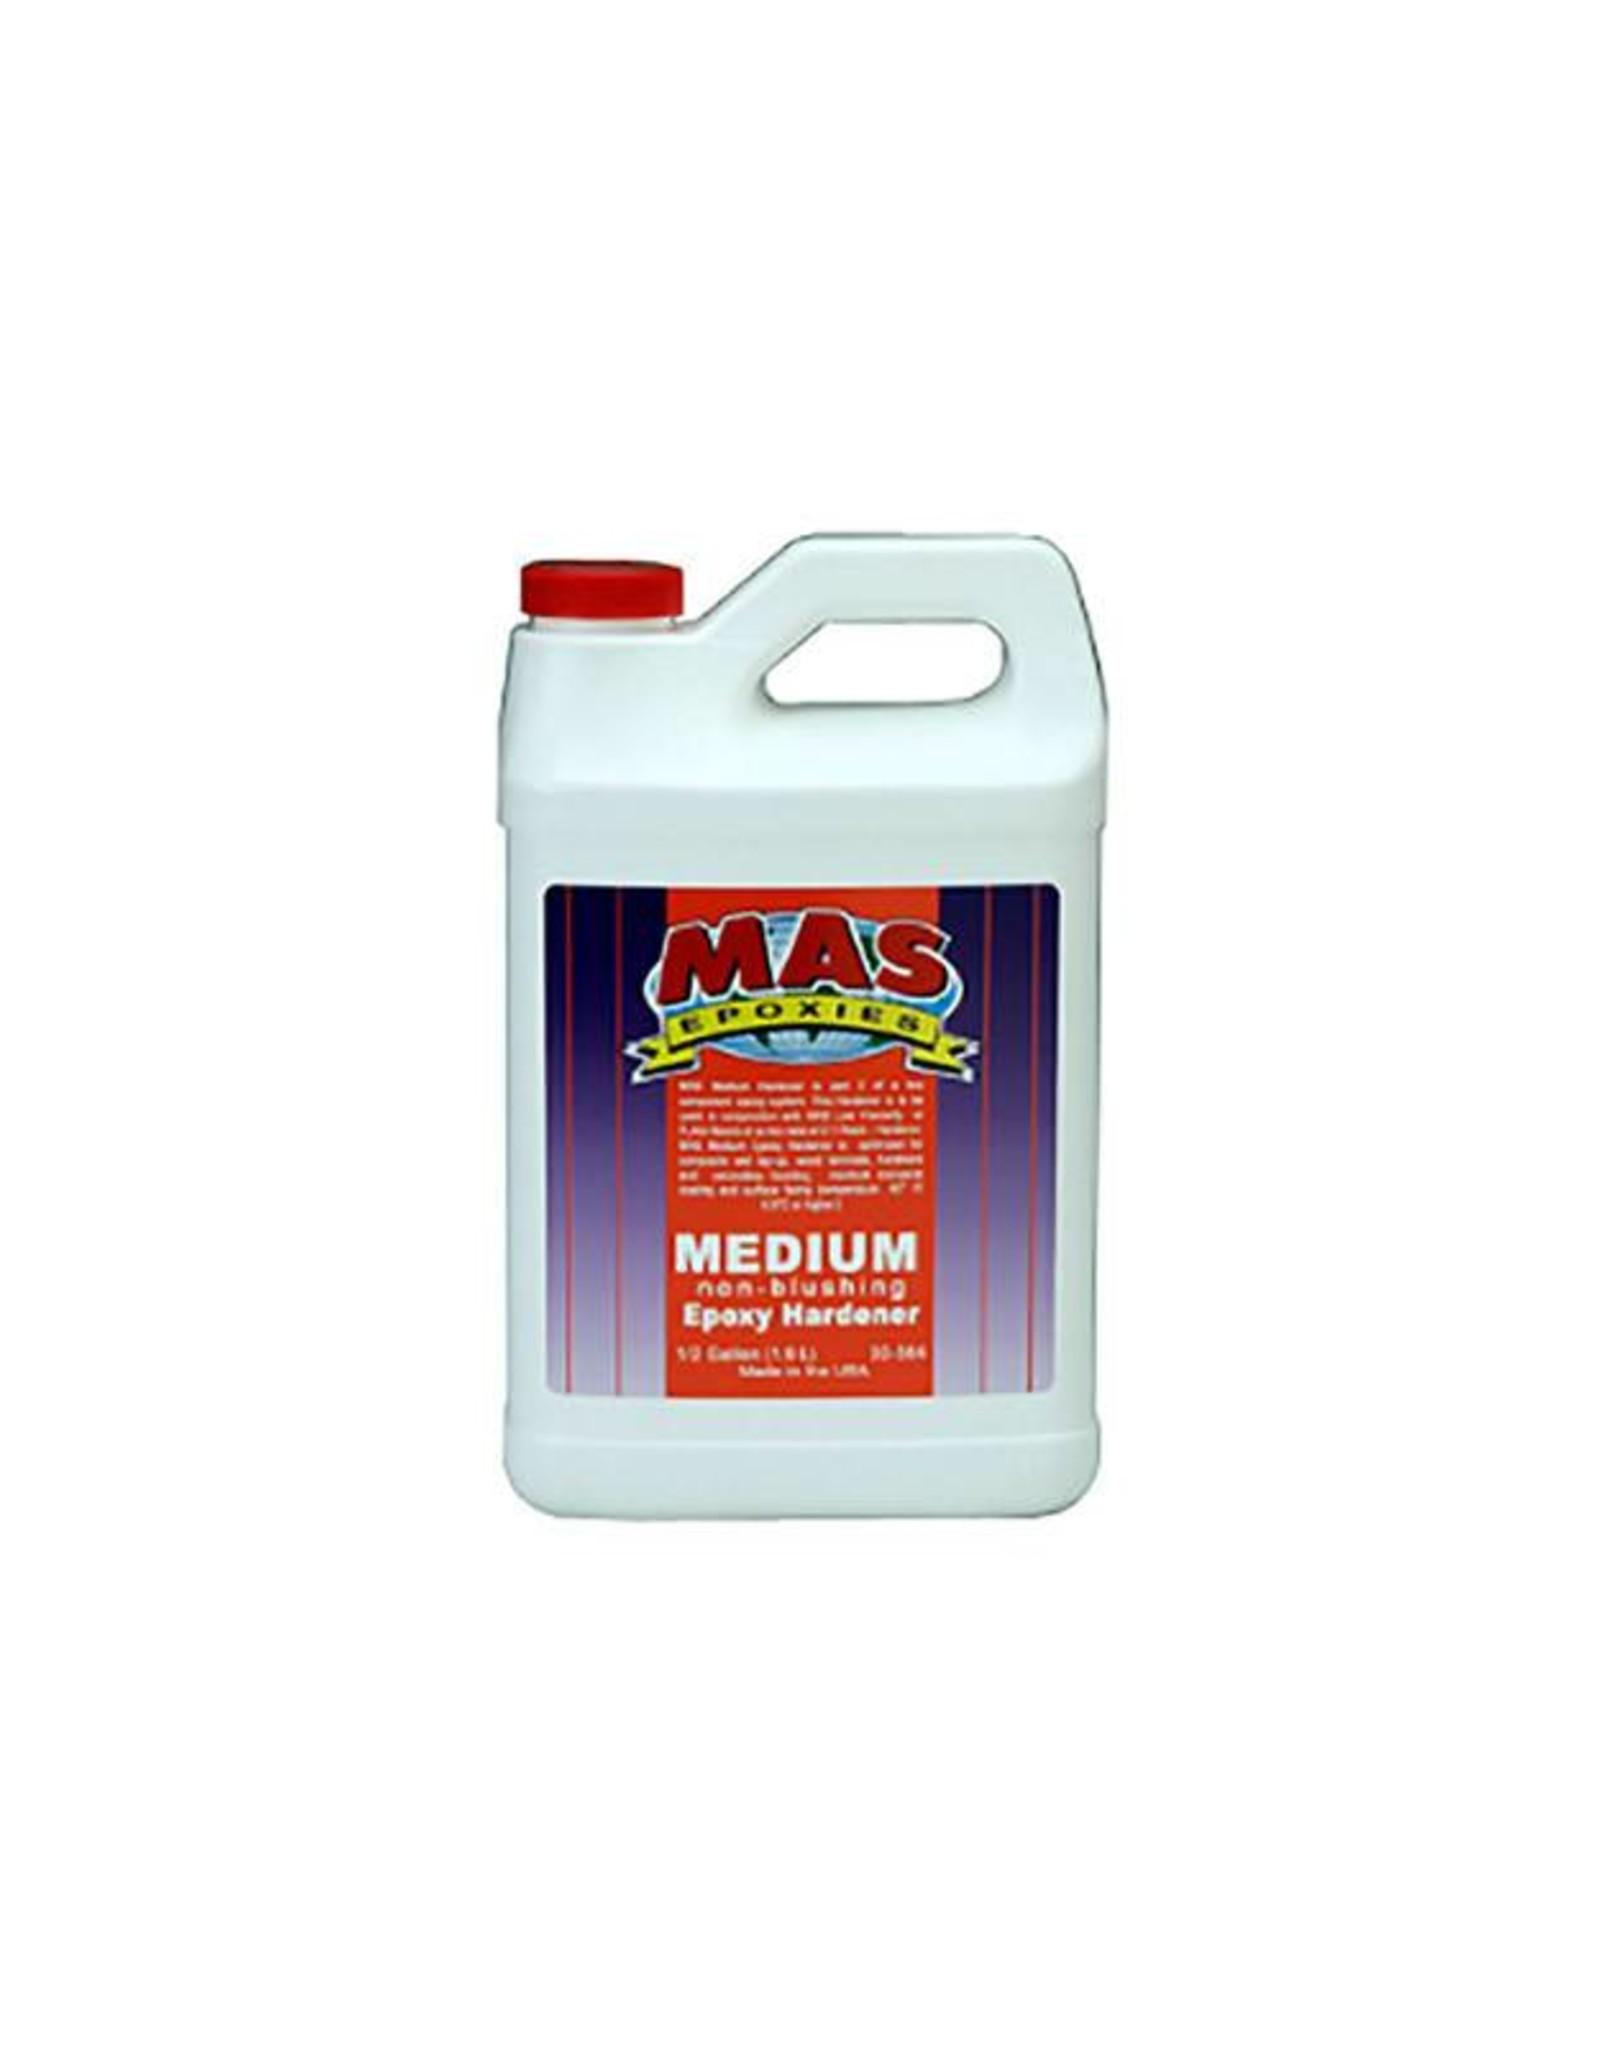 Medium epoxy resin hardener